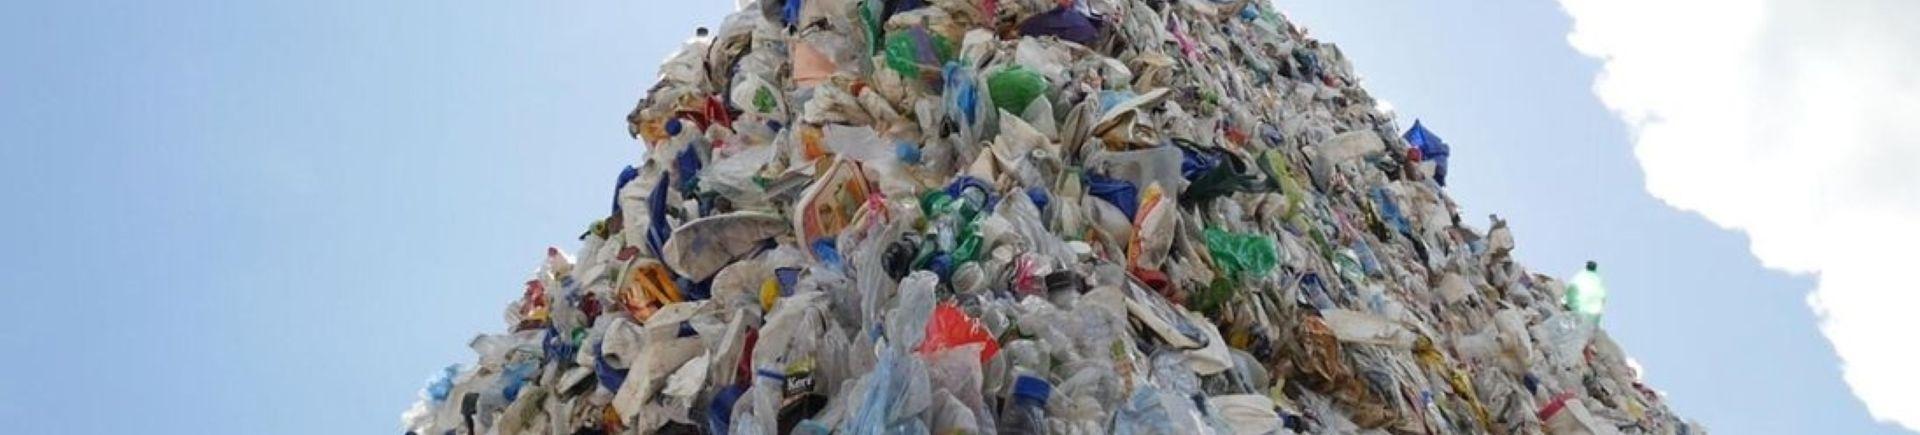 DANONE-Waste